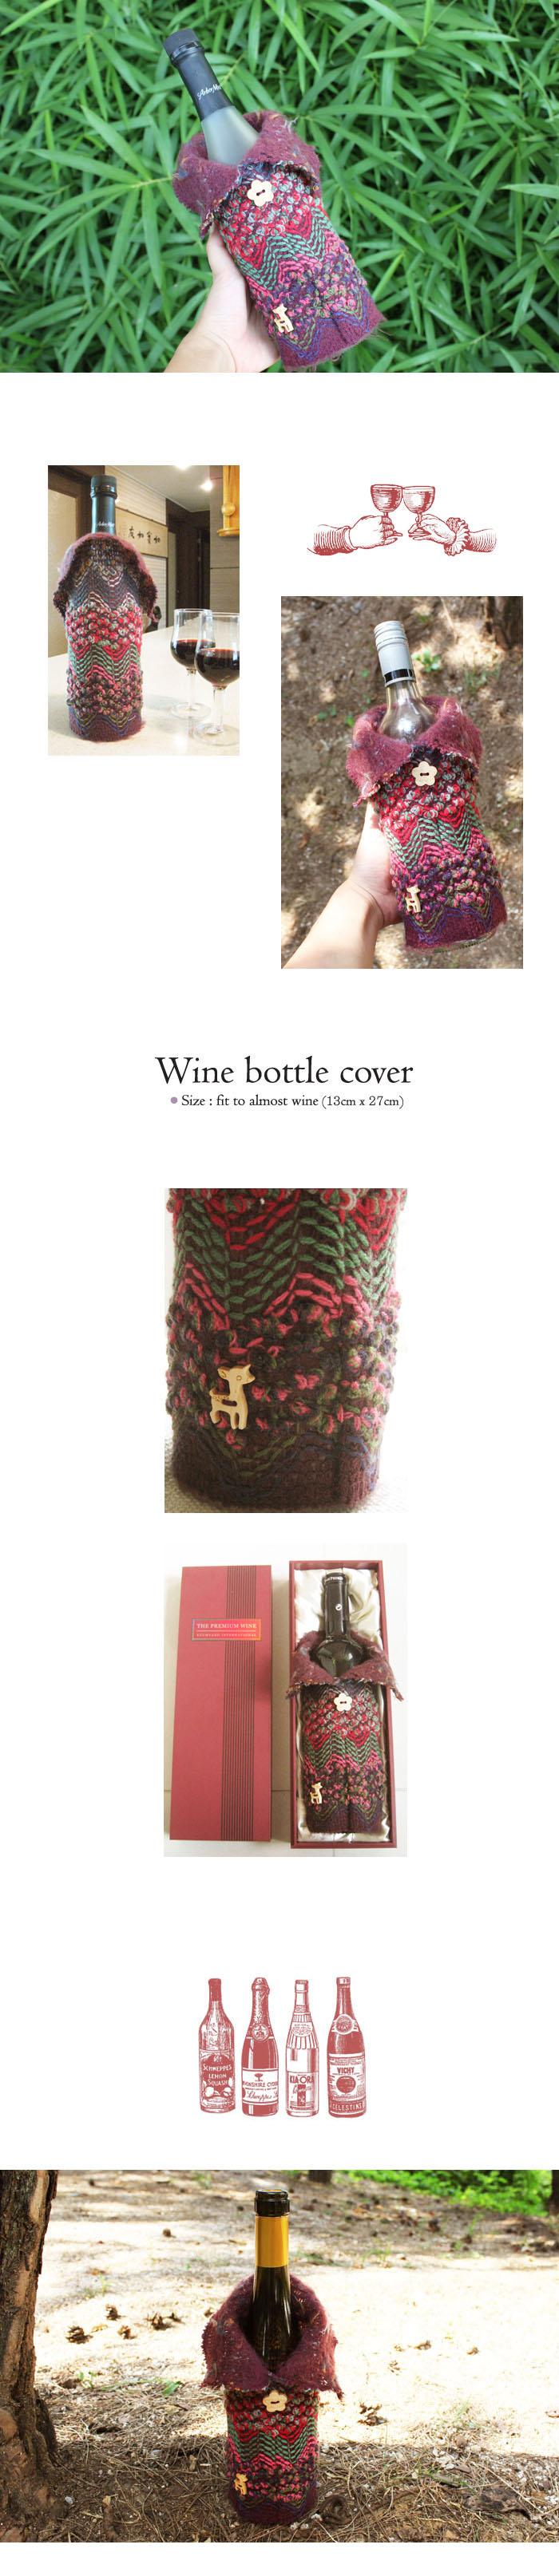 Wine bottle cover -C - 램램, 12,000원, 와인용품, 와인코르크